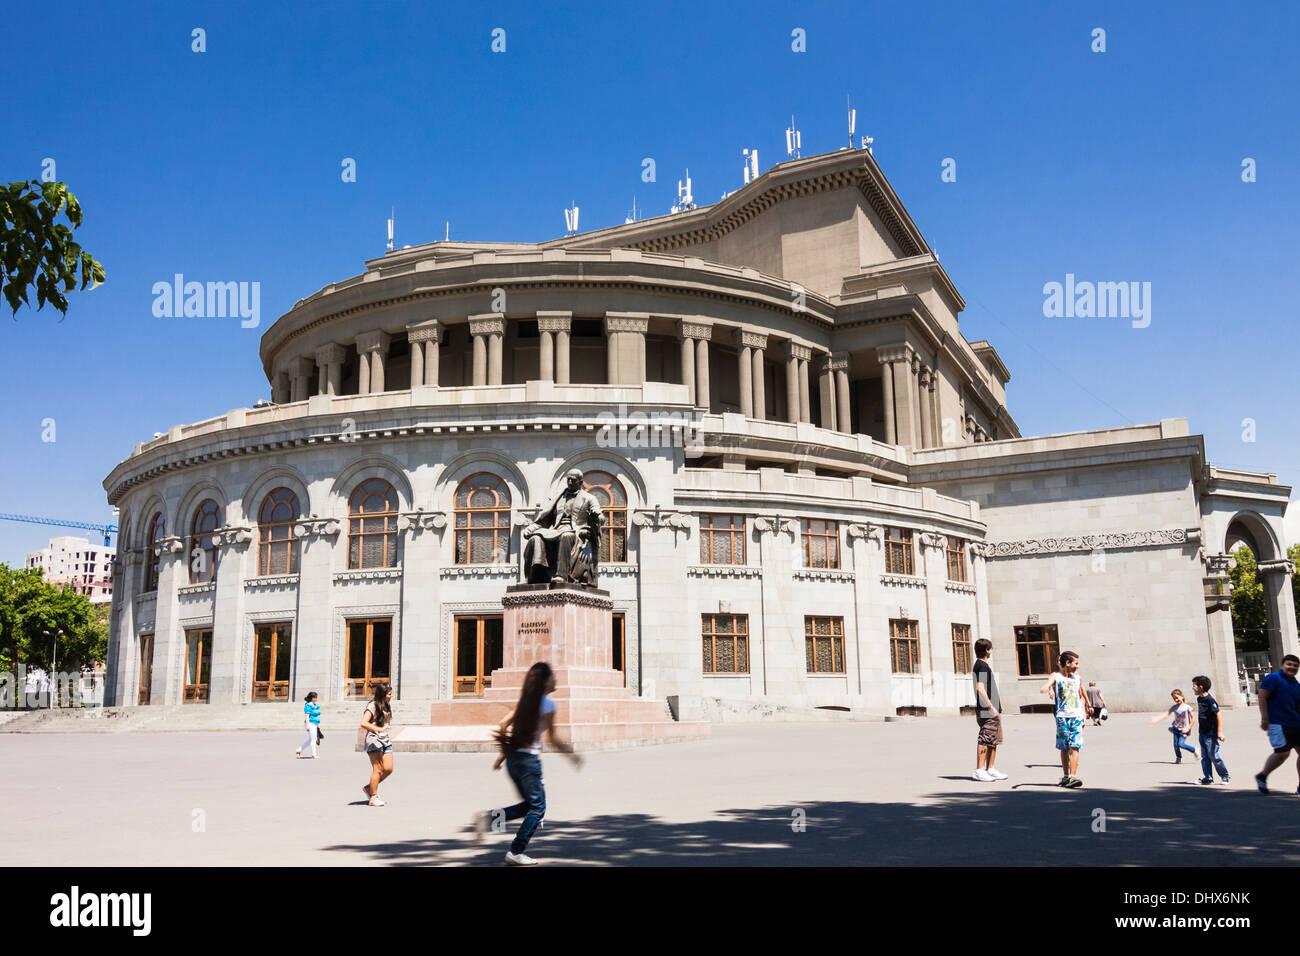 O Teatro da Ópera de Yerevan, Arménia Imagens de Stock